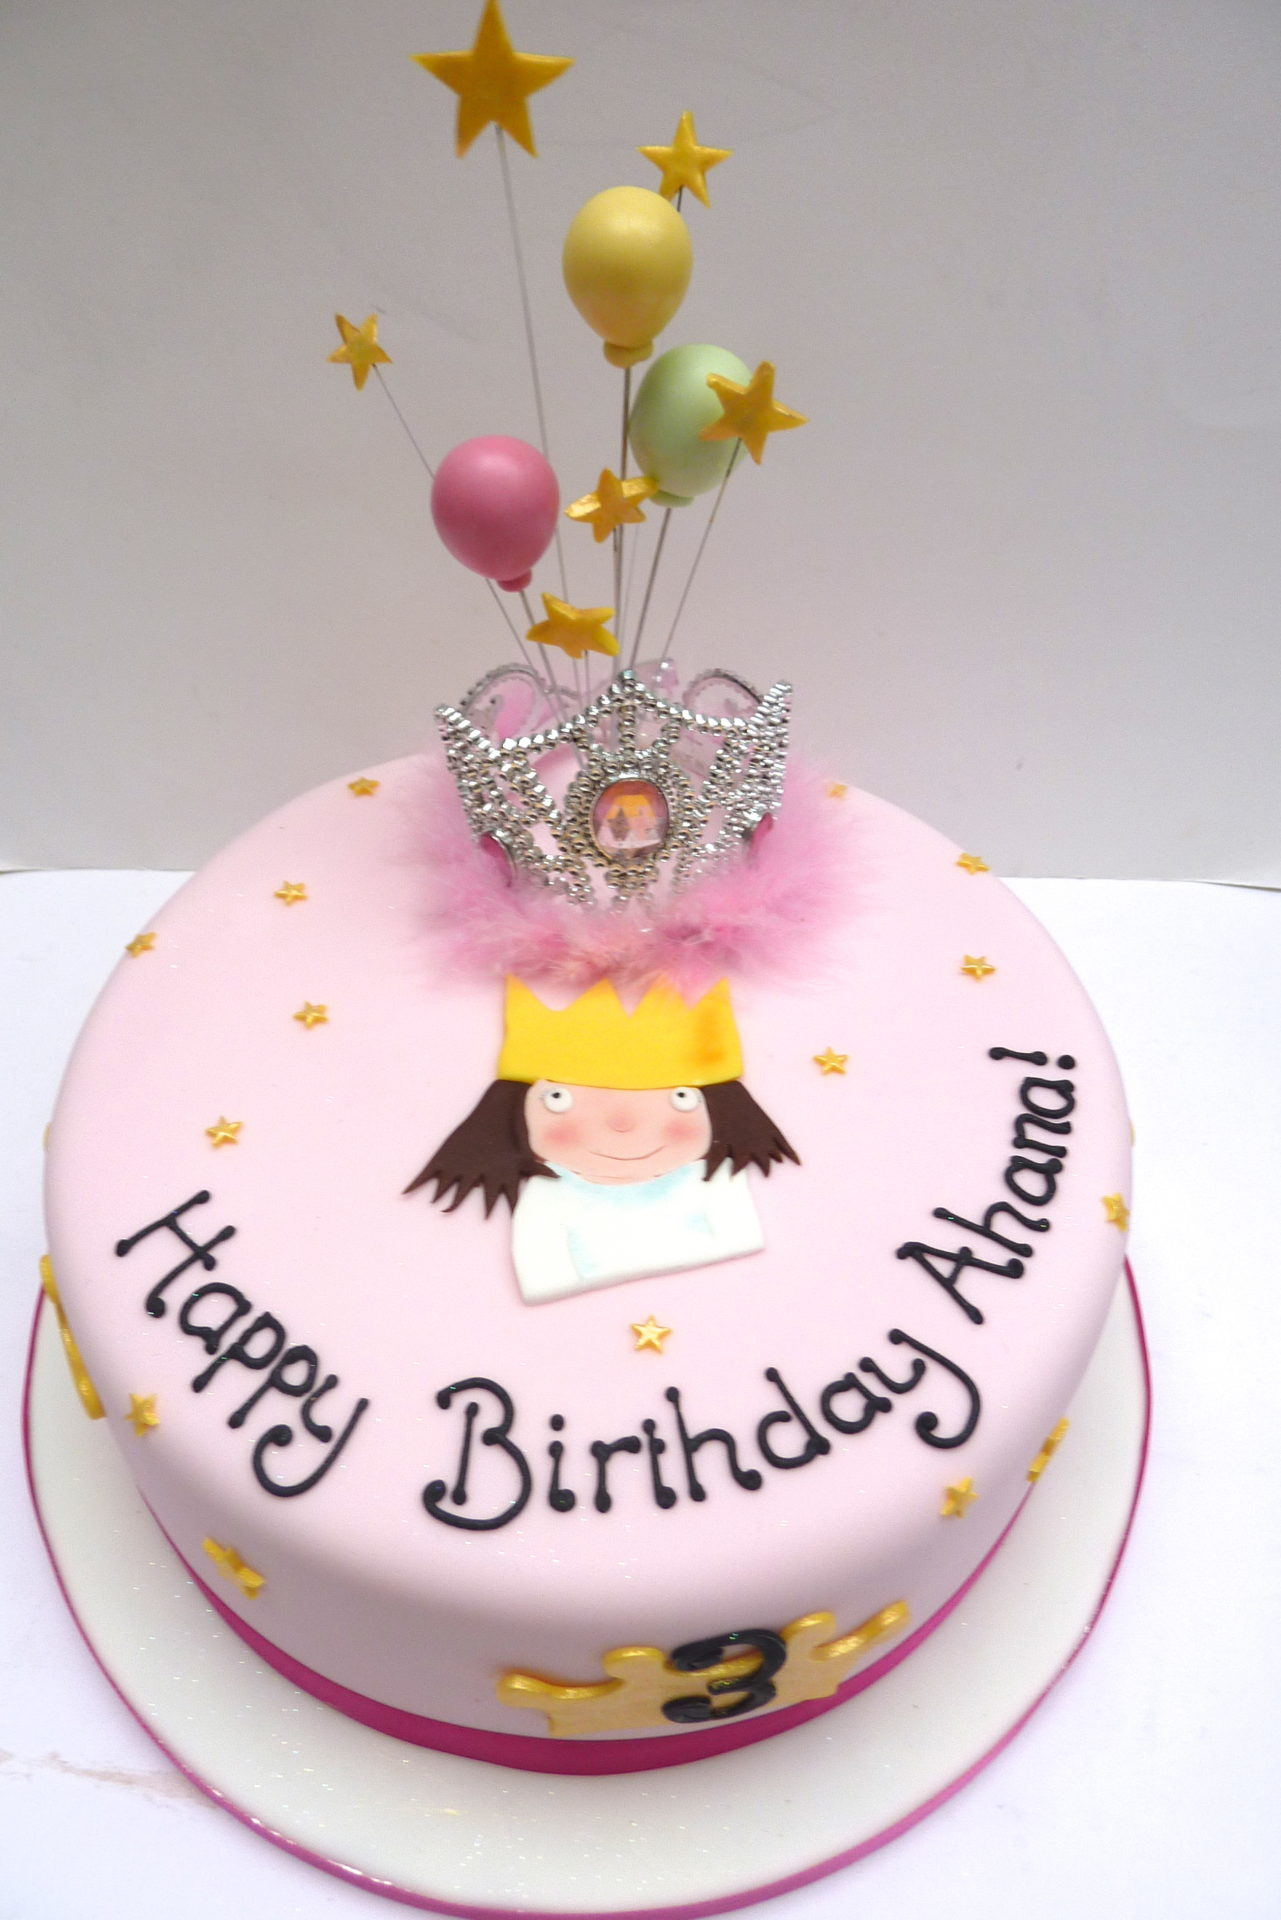 Pleasant My Little Princess Birthday Cake Etoile Bakery Funny Birthday Cards Online Inifodamsfinfo